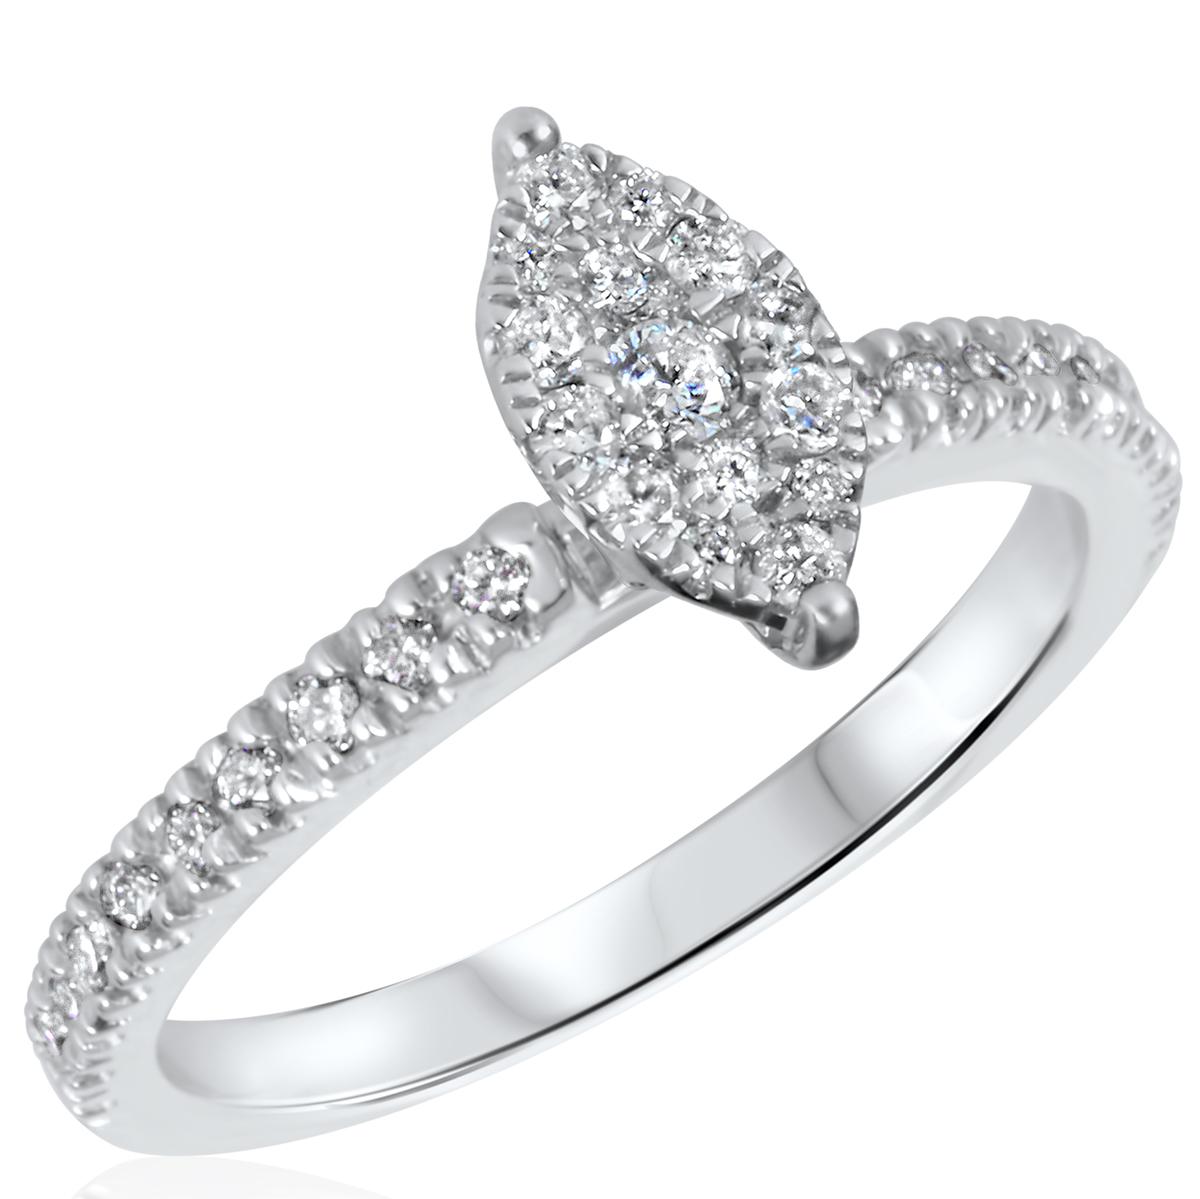 3/8 CT. T.W. Diamond Ladies Engagement Ring 14K White Gold- Size 8